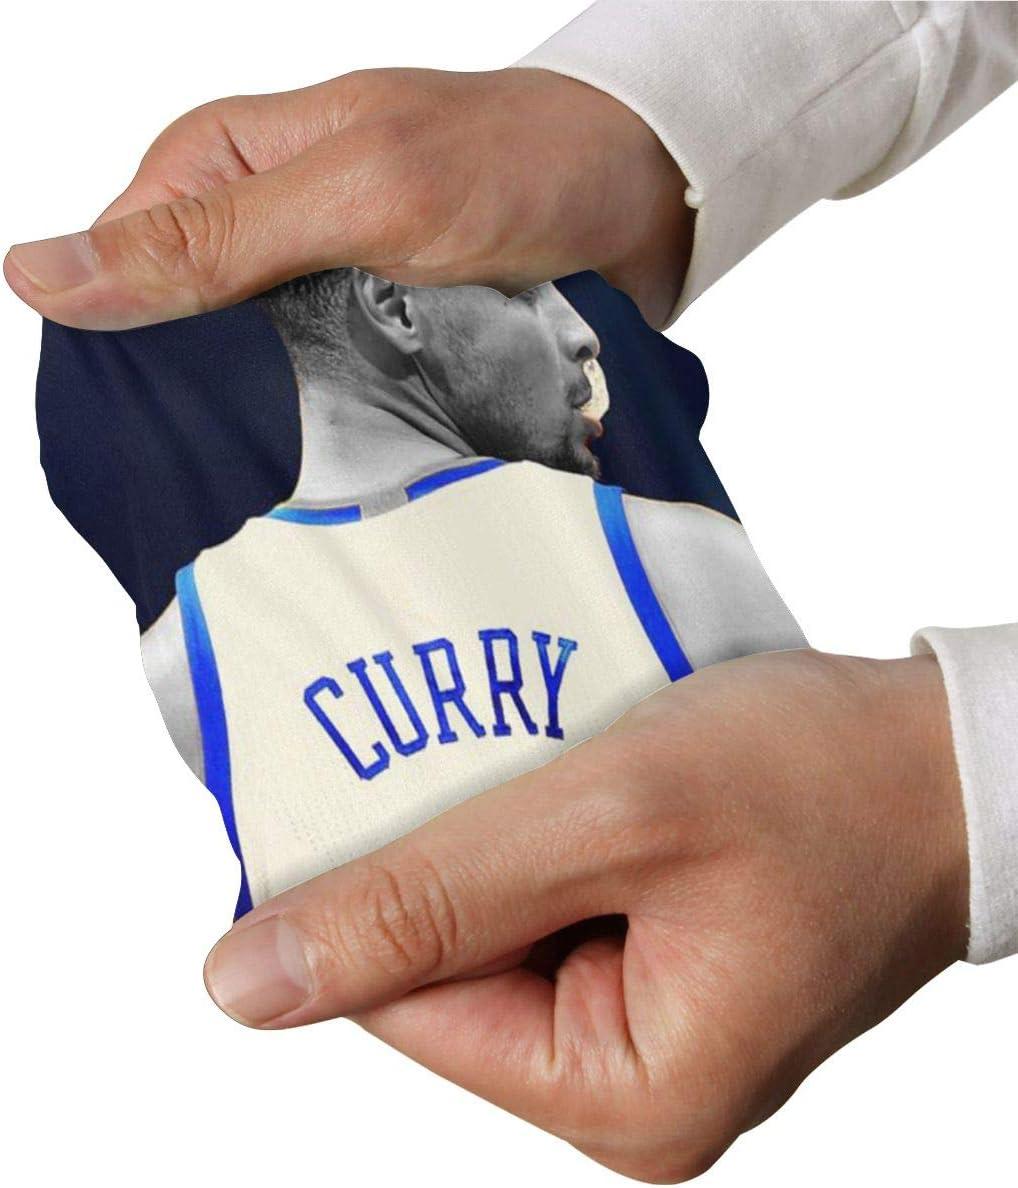 Ameliaa Curry Sport Arm Shooter Sleeves Basketball Baseball Football Sport One Pair Arm Sleeves